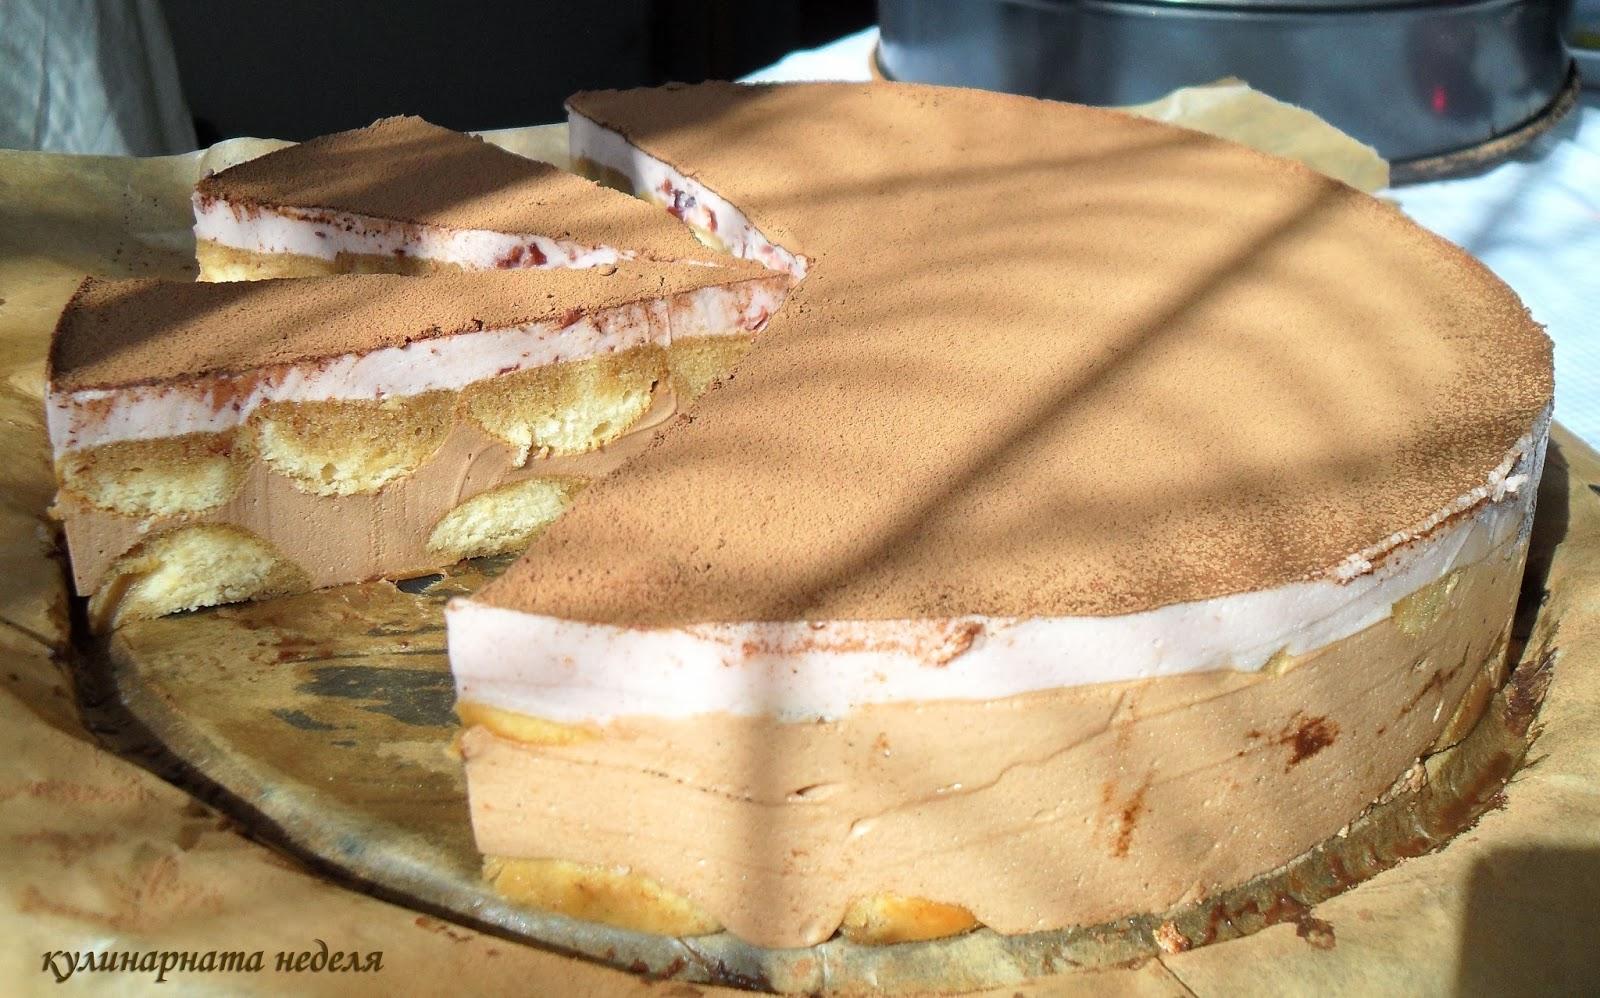 Заказ с доставкой торта фото 11